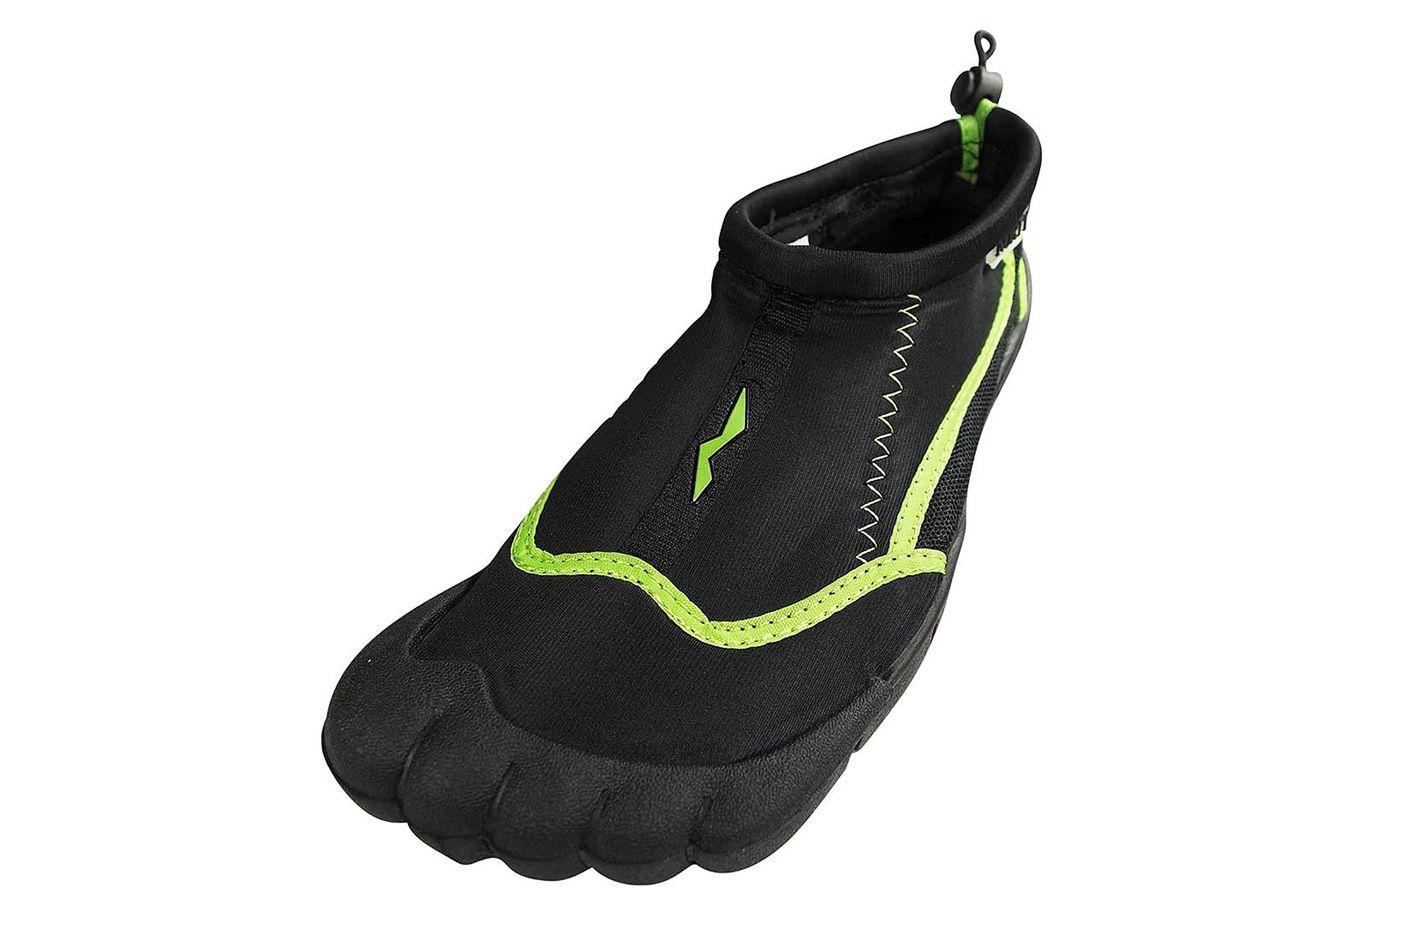 Toe Shoes Diving